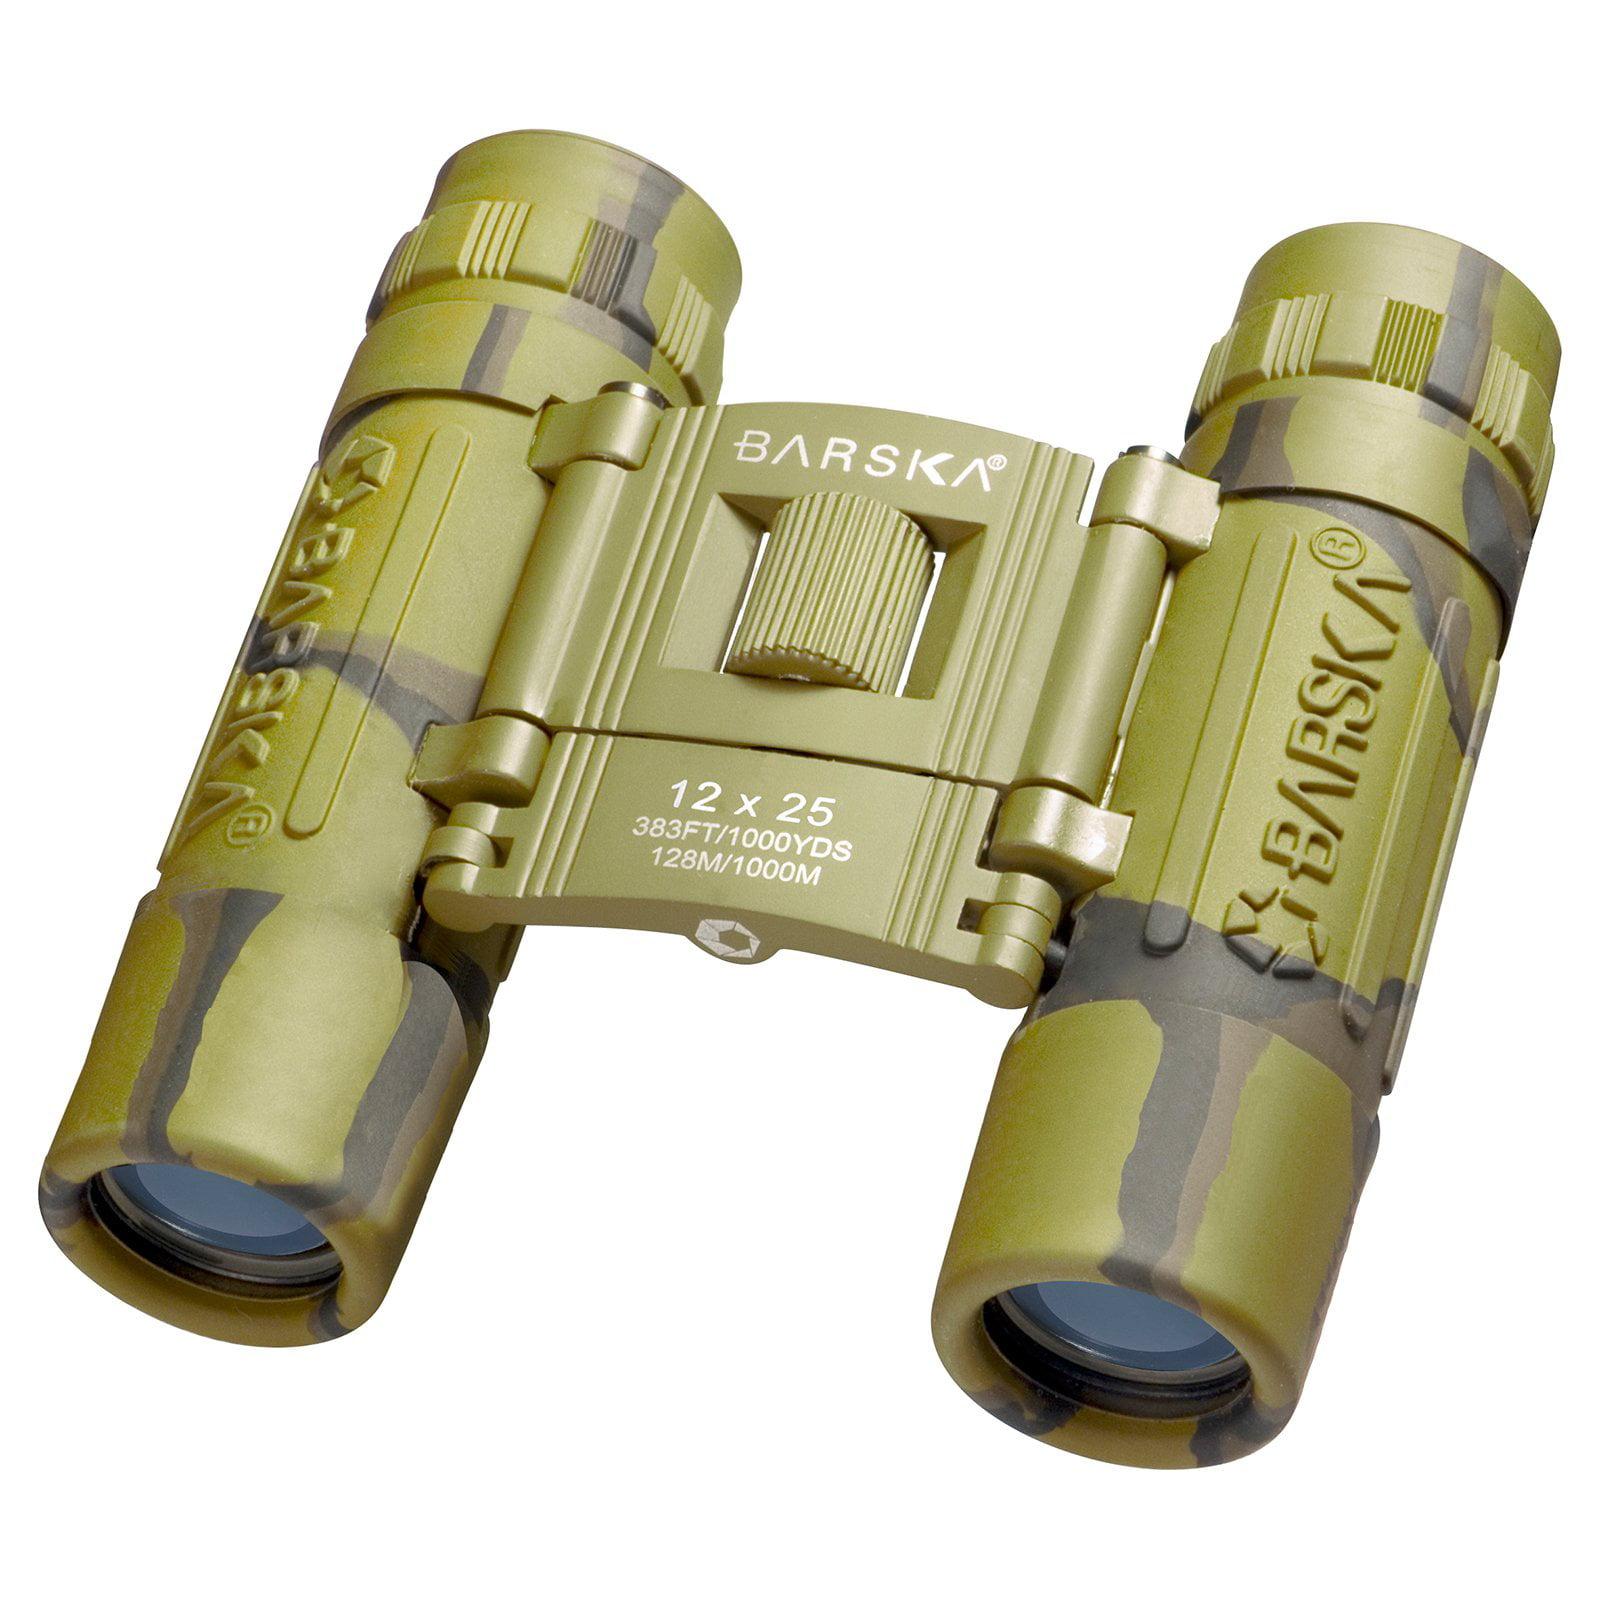 Barska 12x25 Lucid View Binoculars